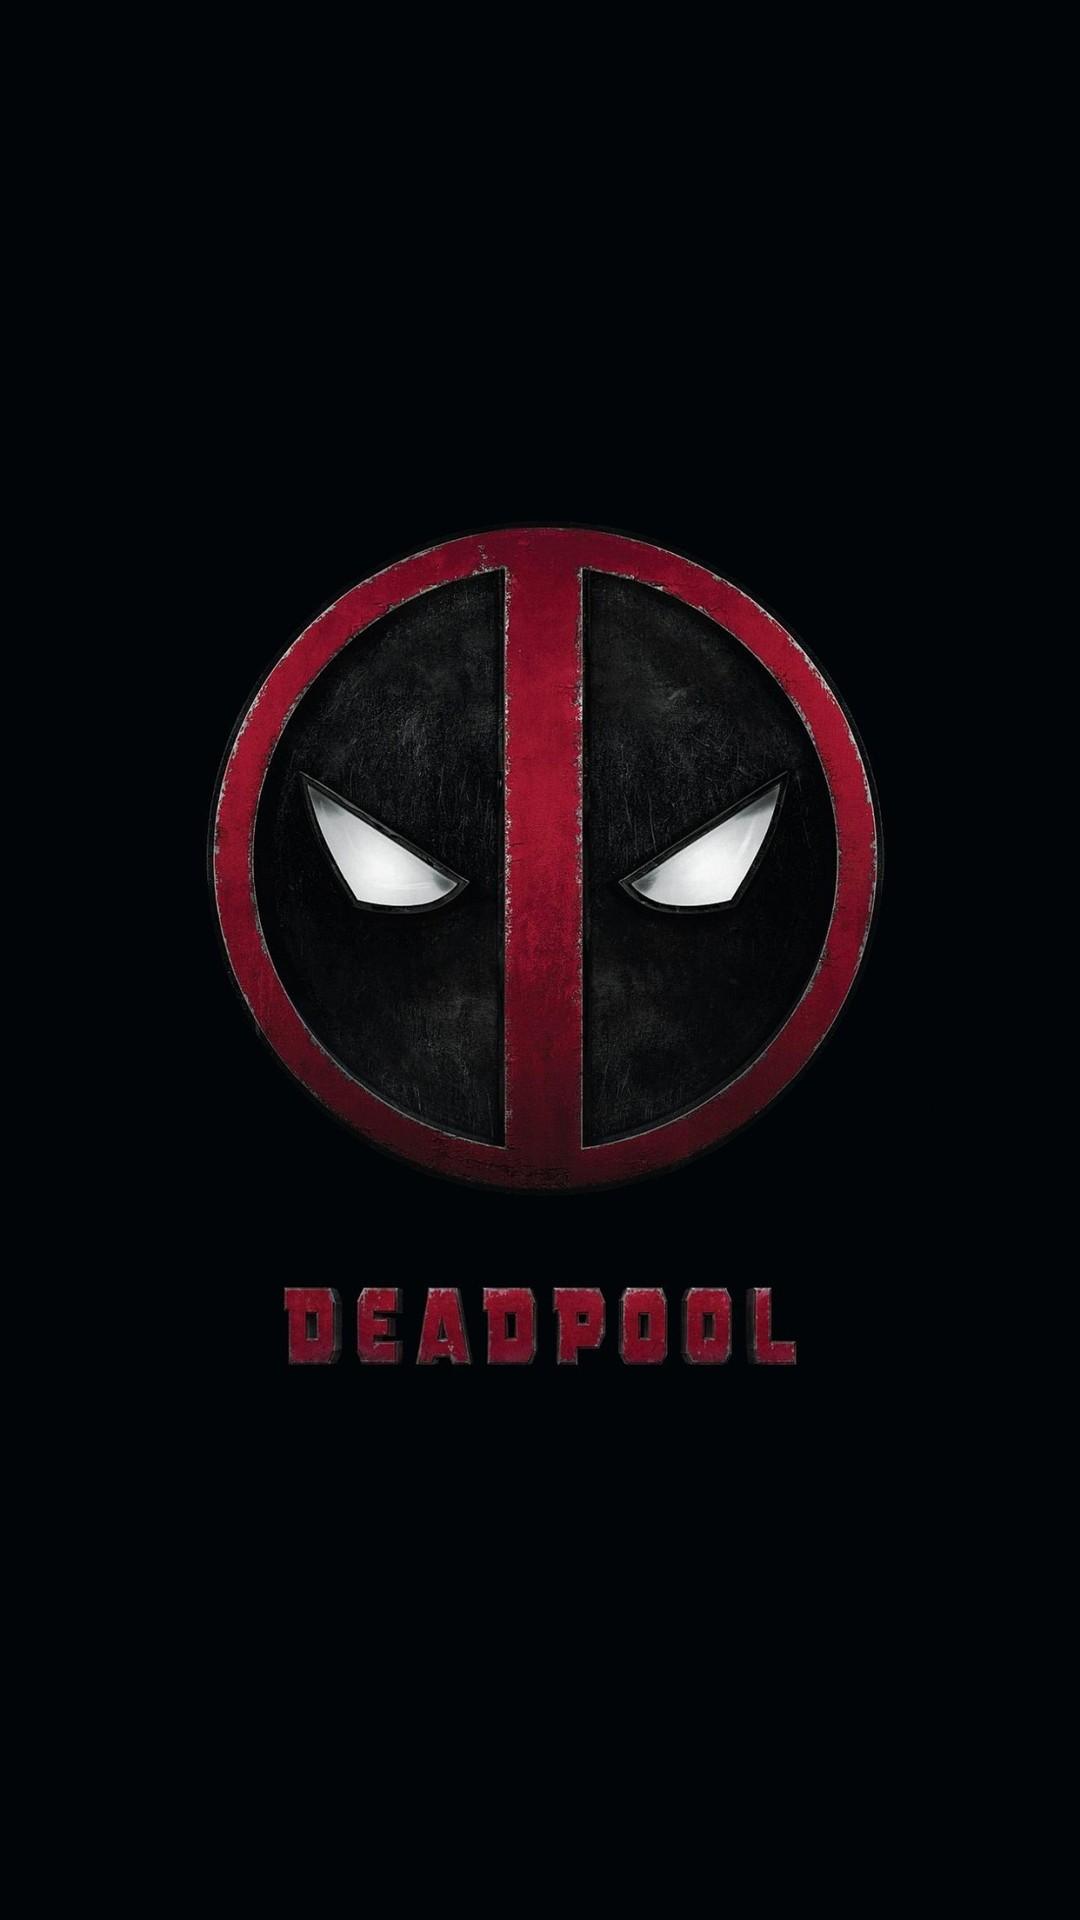 Deadpool Iphone Wallpaper Hd 71 Images